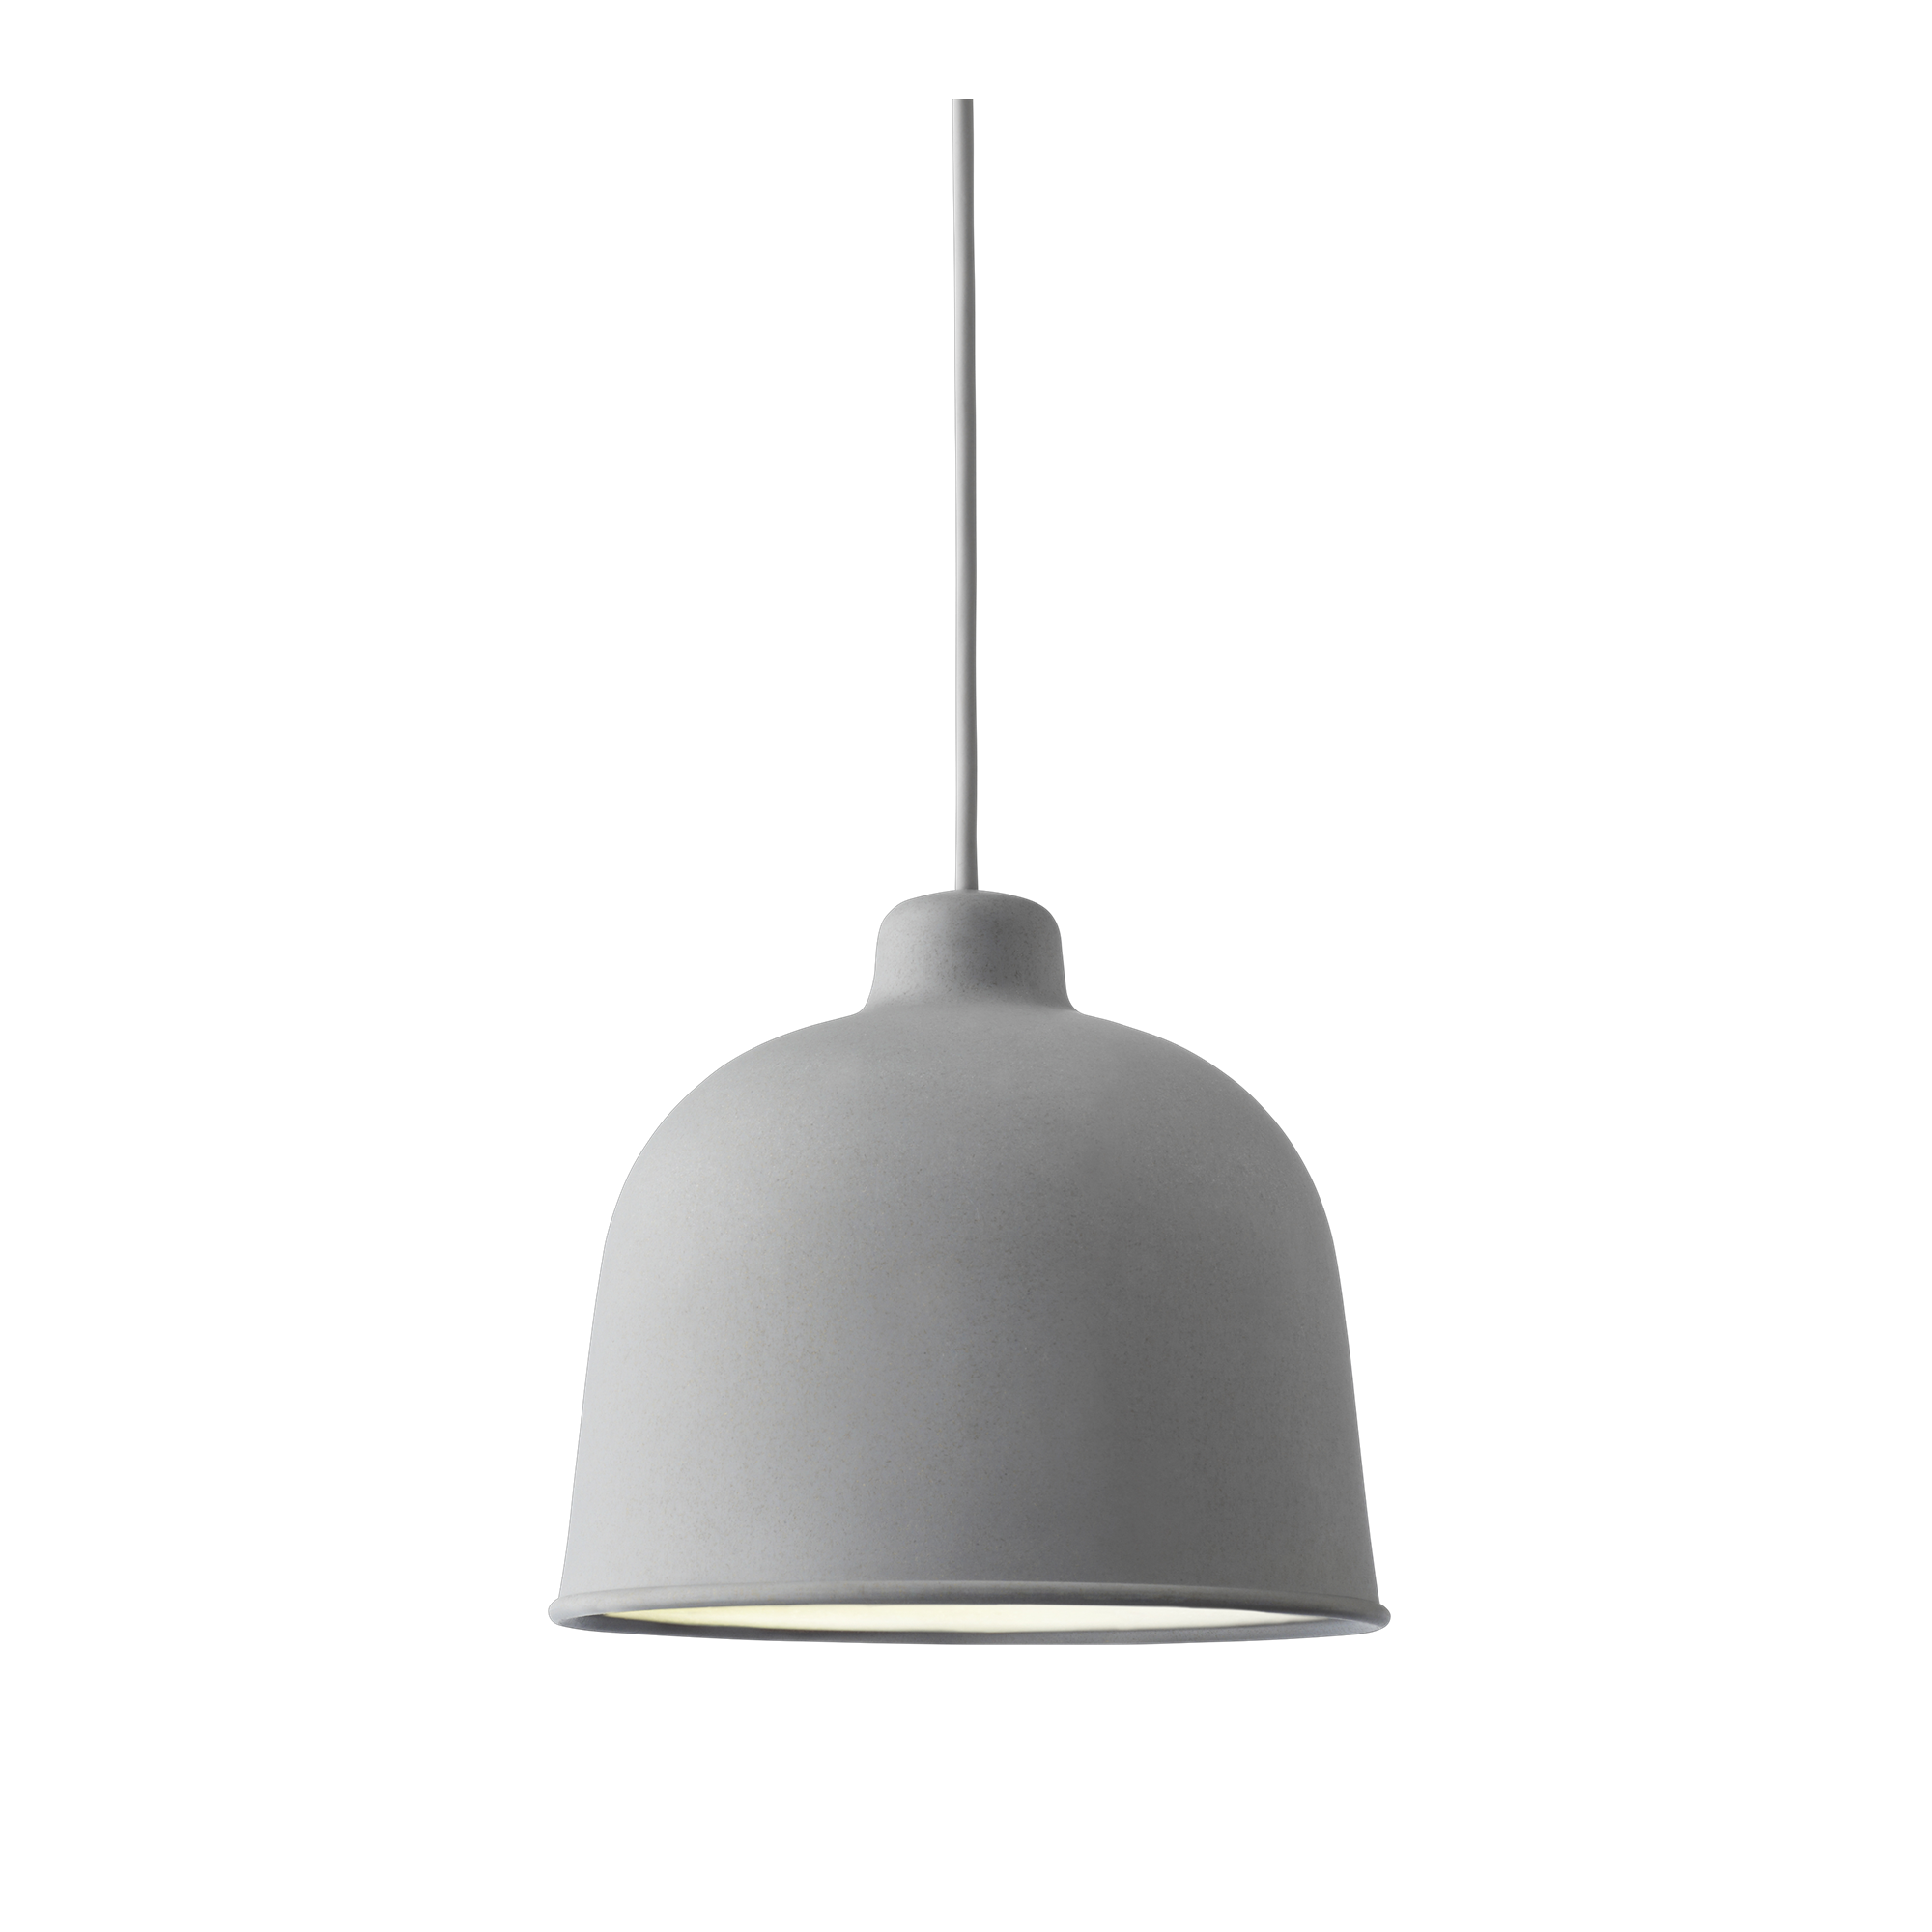 Muuto Grain Pendant In 2020 Pendant Lamp Lamp Modern Pendant Lamps